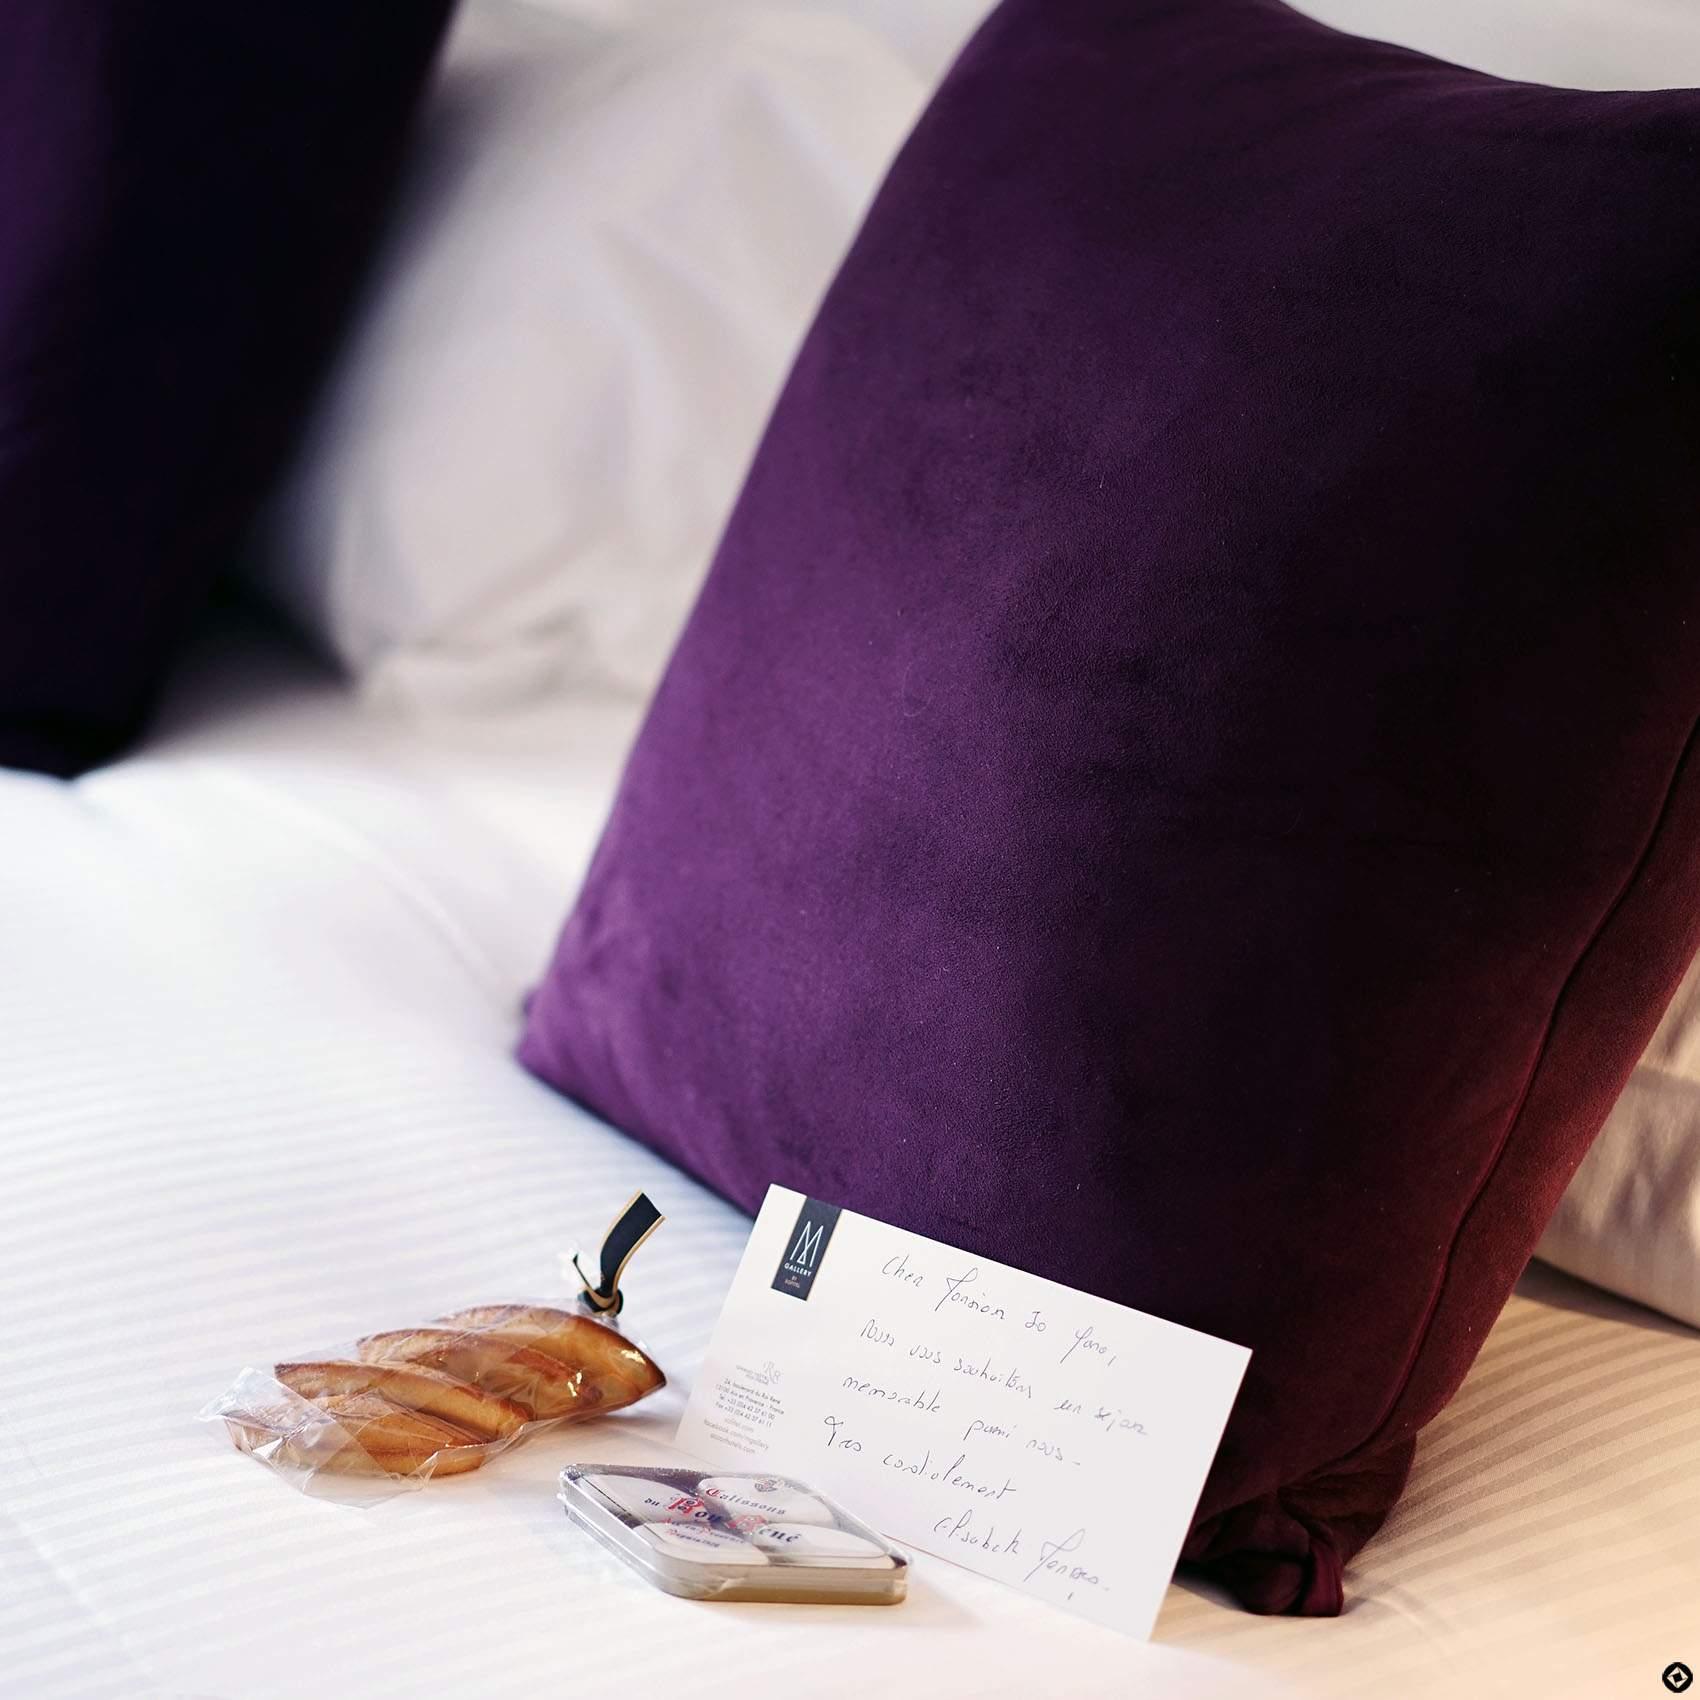 grand-hotel-roi-rene-blog-deco-design_14